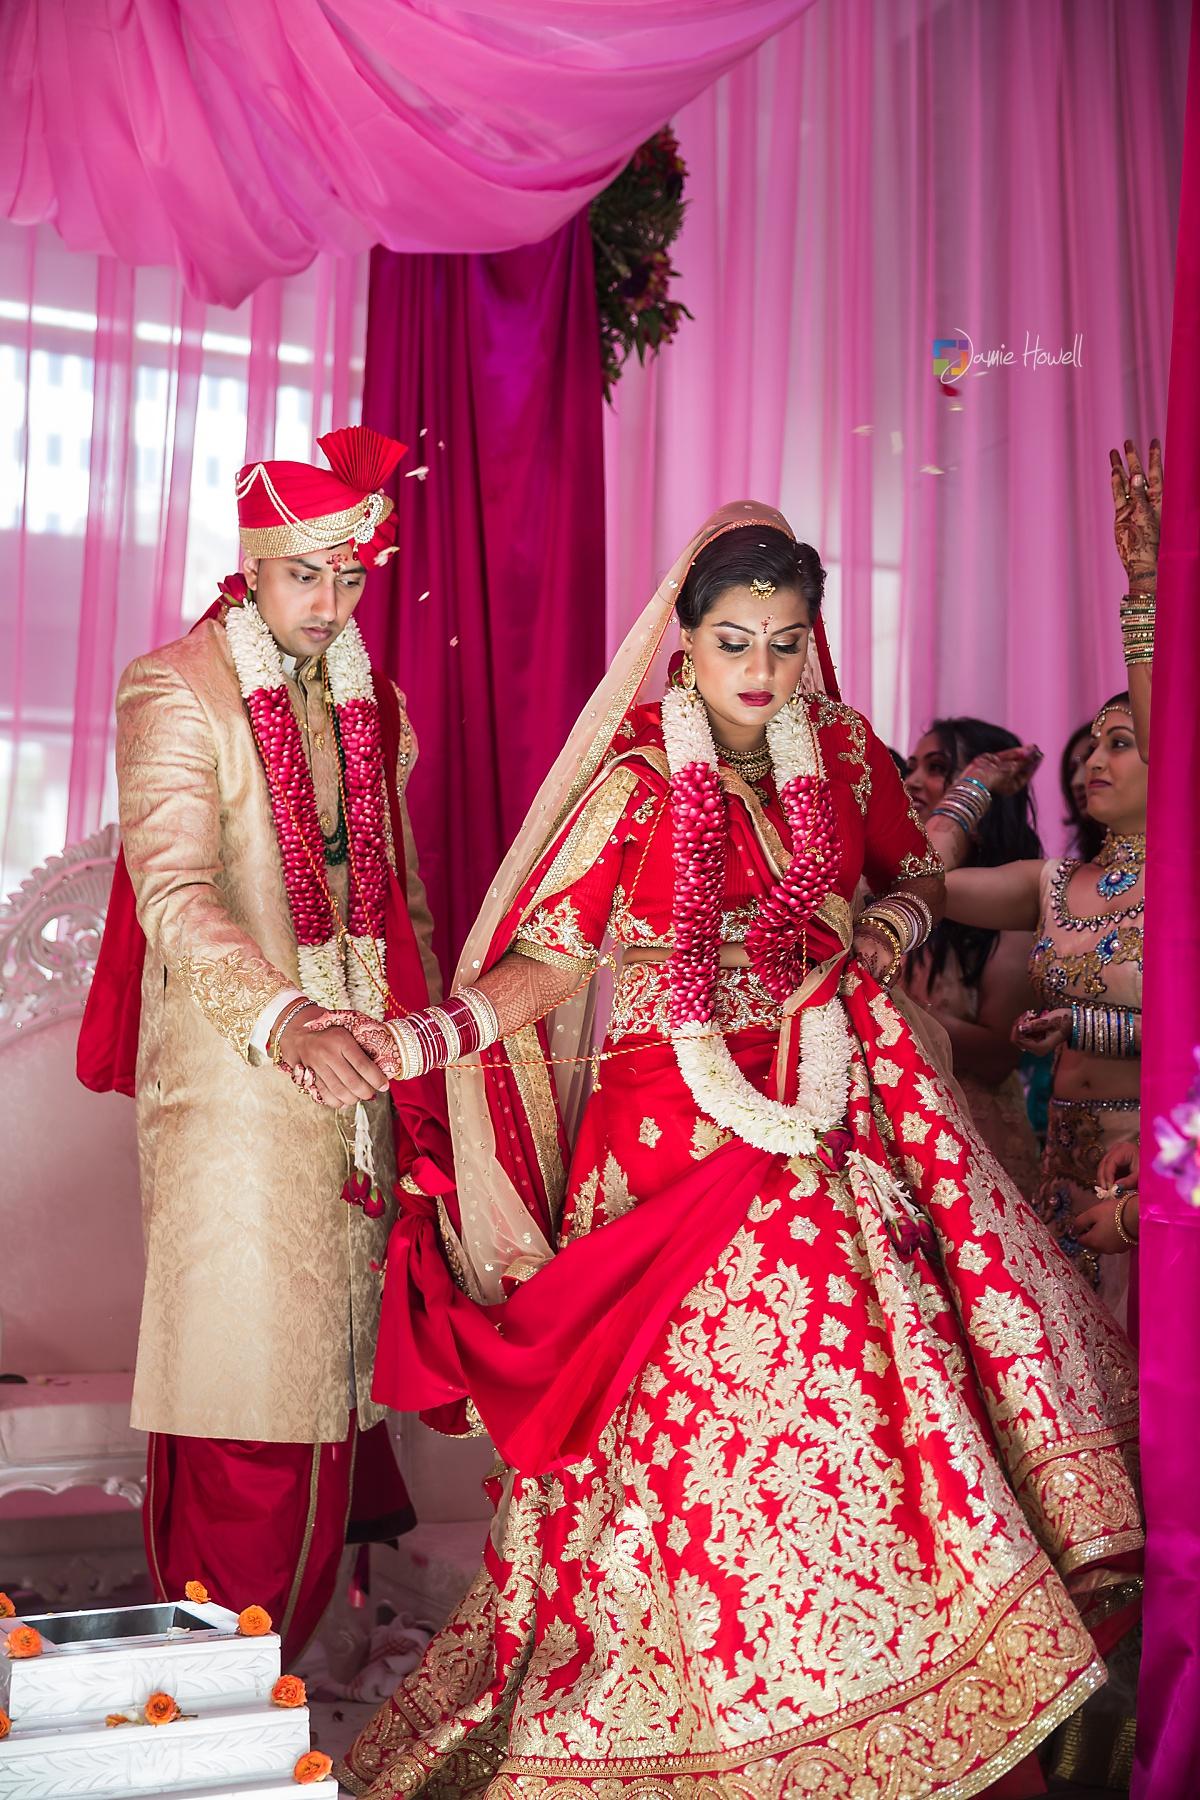 Hilton Charlotte Center South Asian Wedding (36)